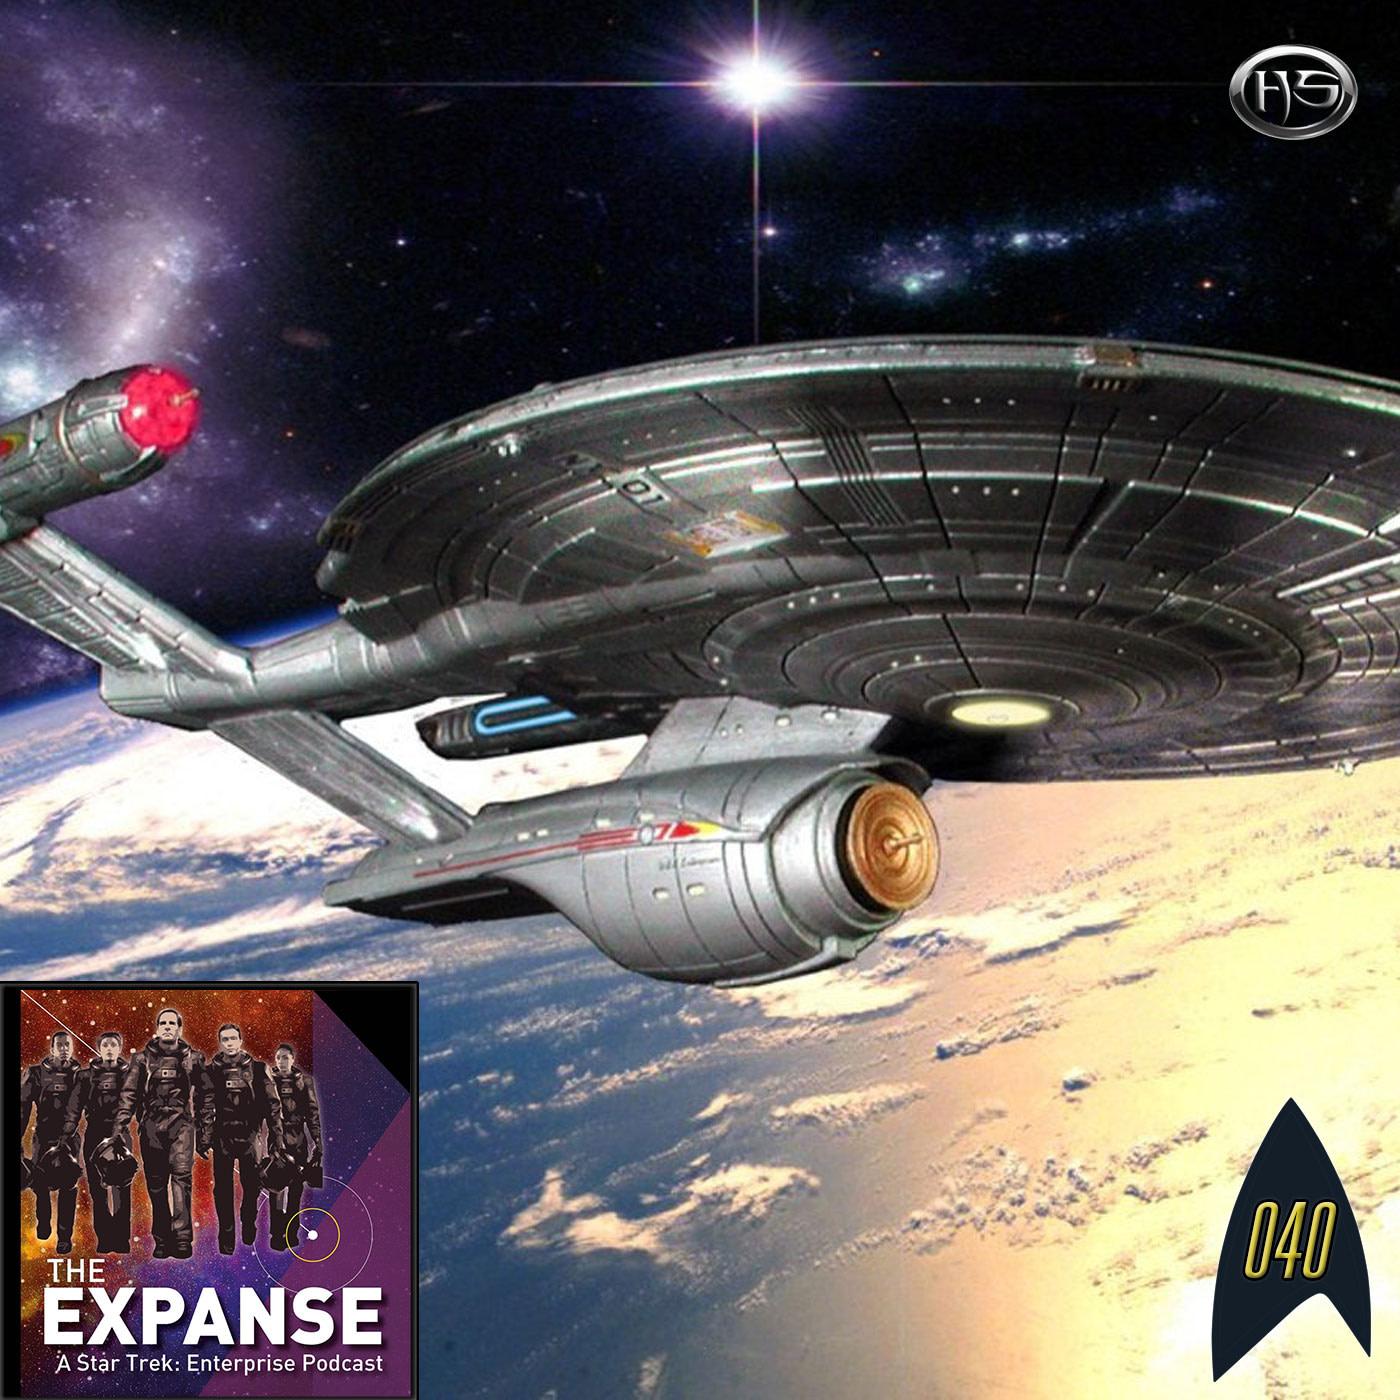 The Expanse Episode 40